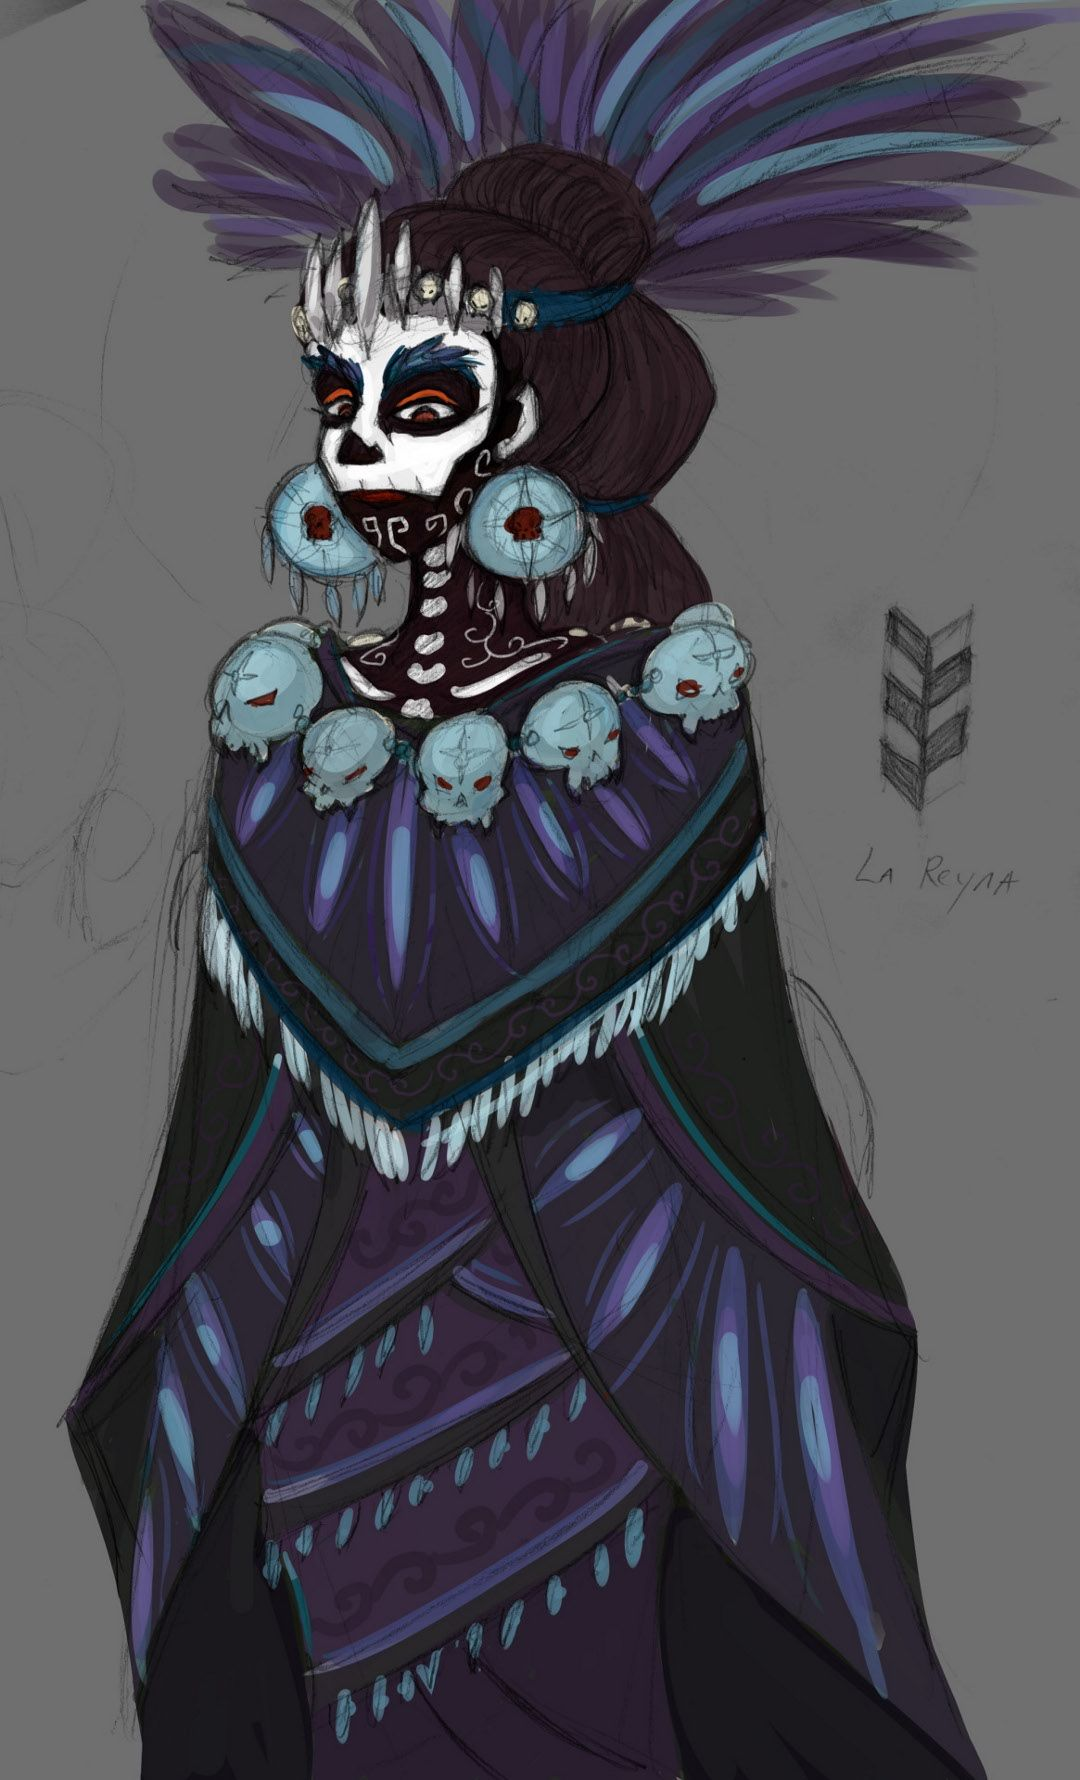 Mictecacihuatl Aztec Goddess of Death + Mictlantecuhtli's wife #aztec